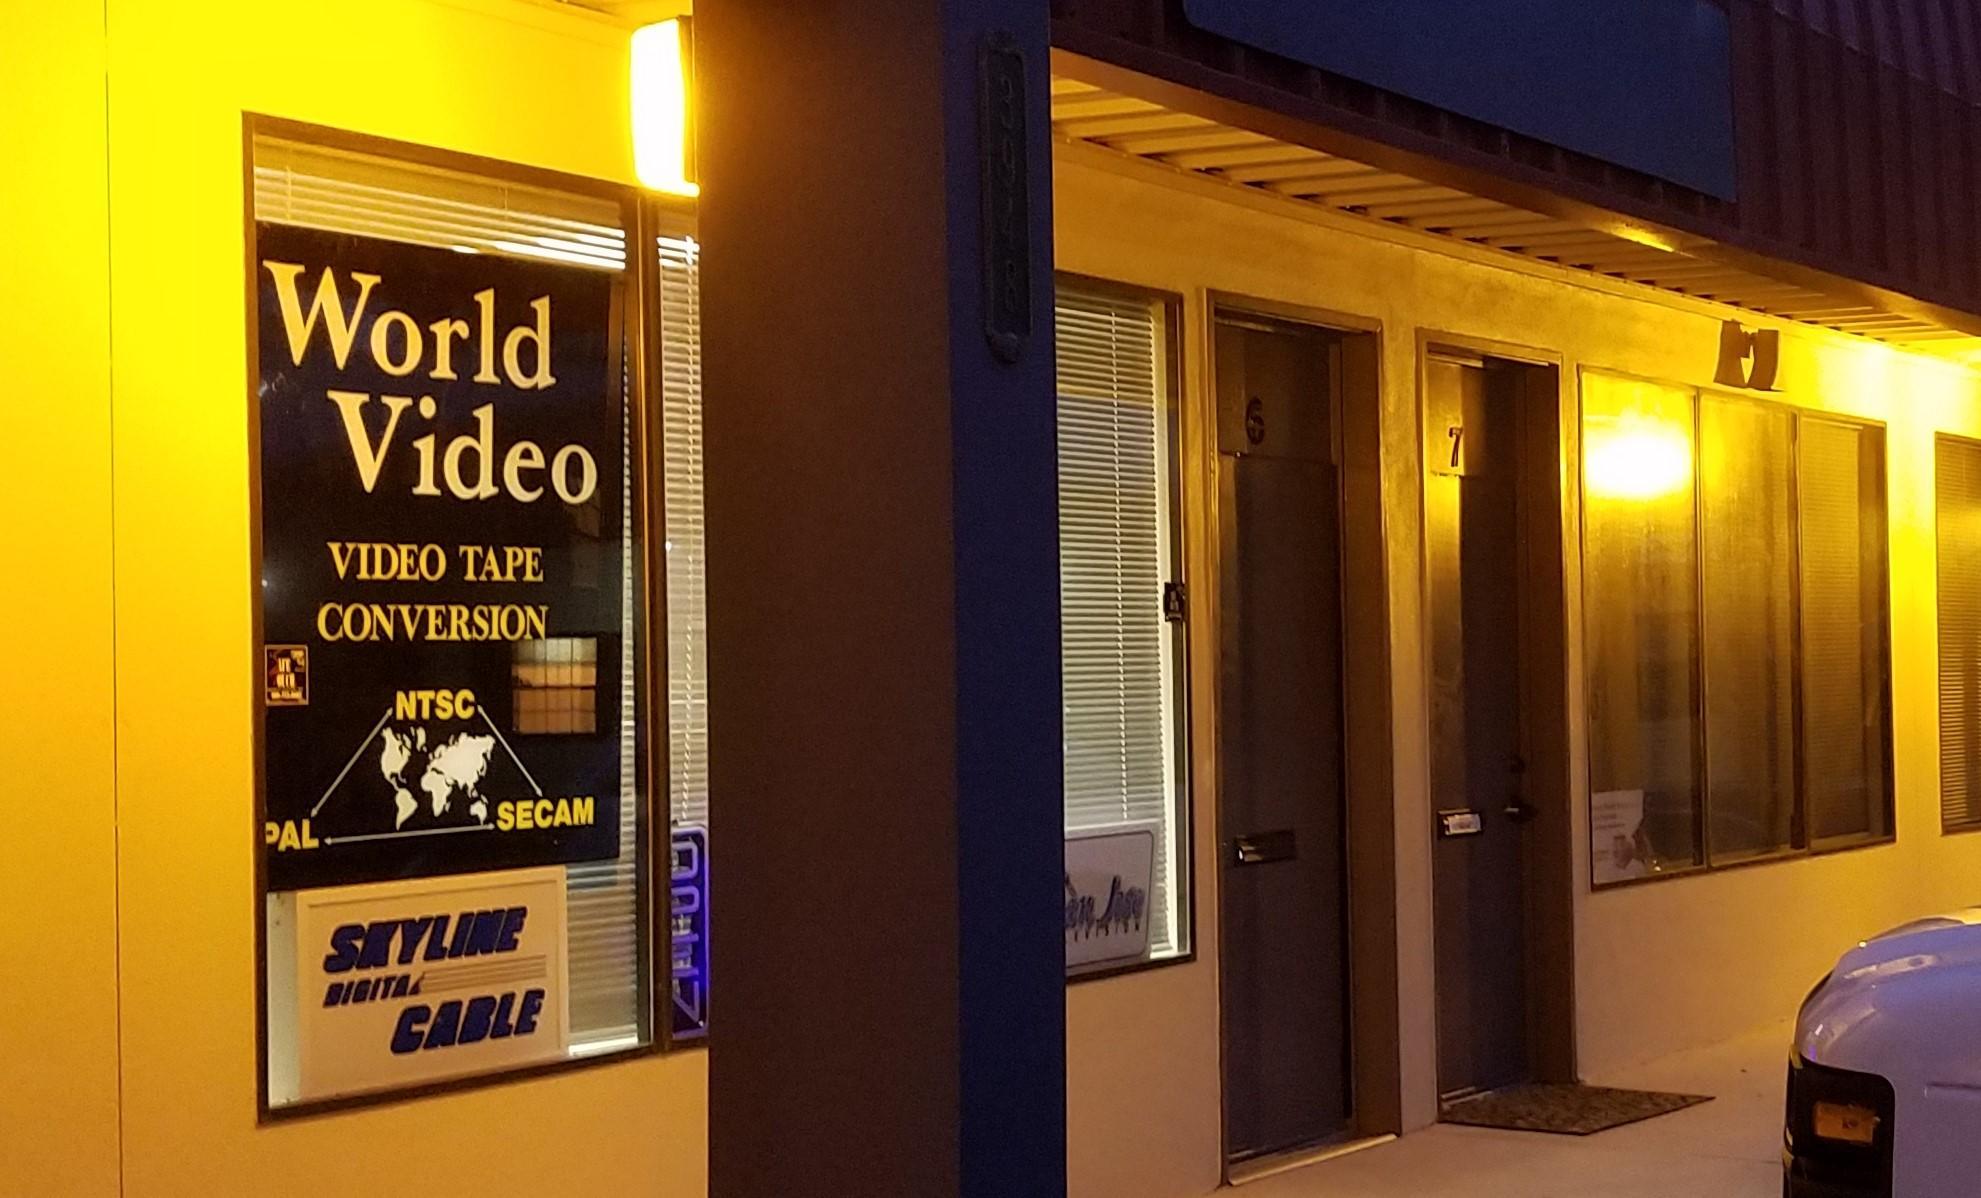 World Video Electronics image 1